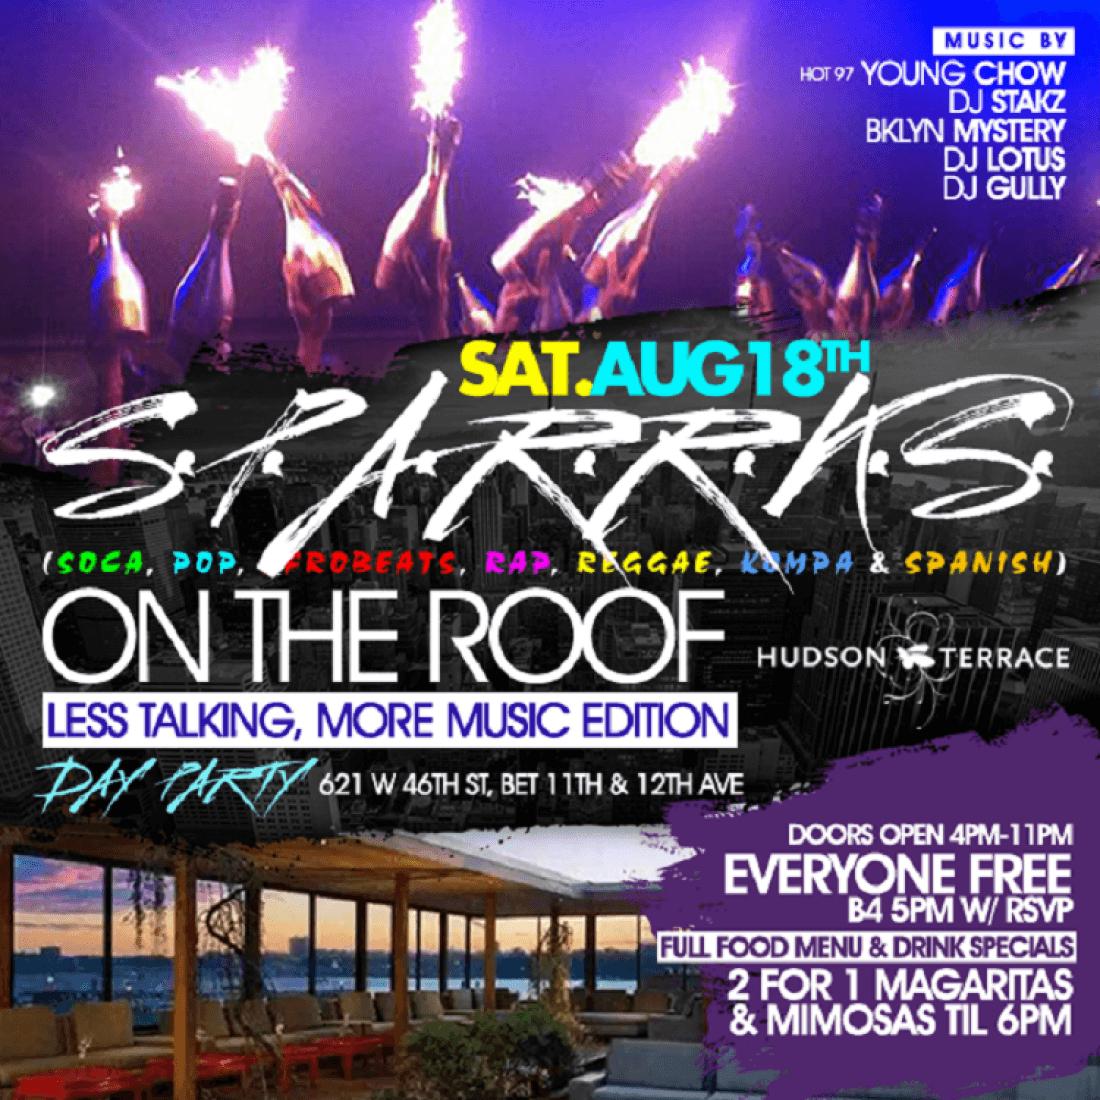 S.P.A.R.R.K.S. (Soca  Pop  Afrobeats  Rap  Reggae  Kompa  Spanish) on the Roof Day Party